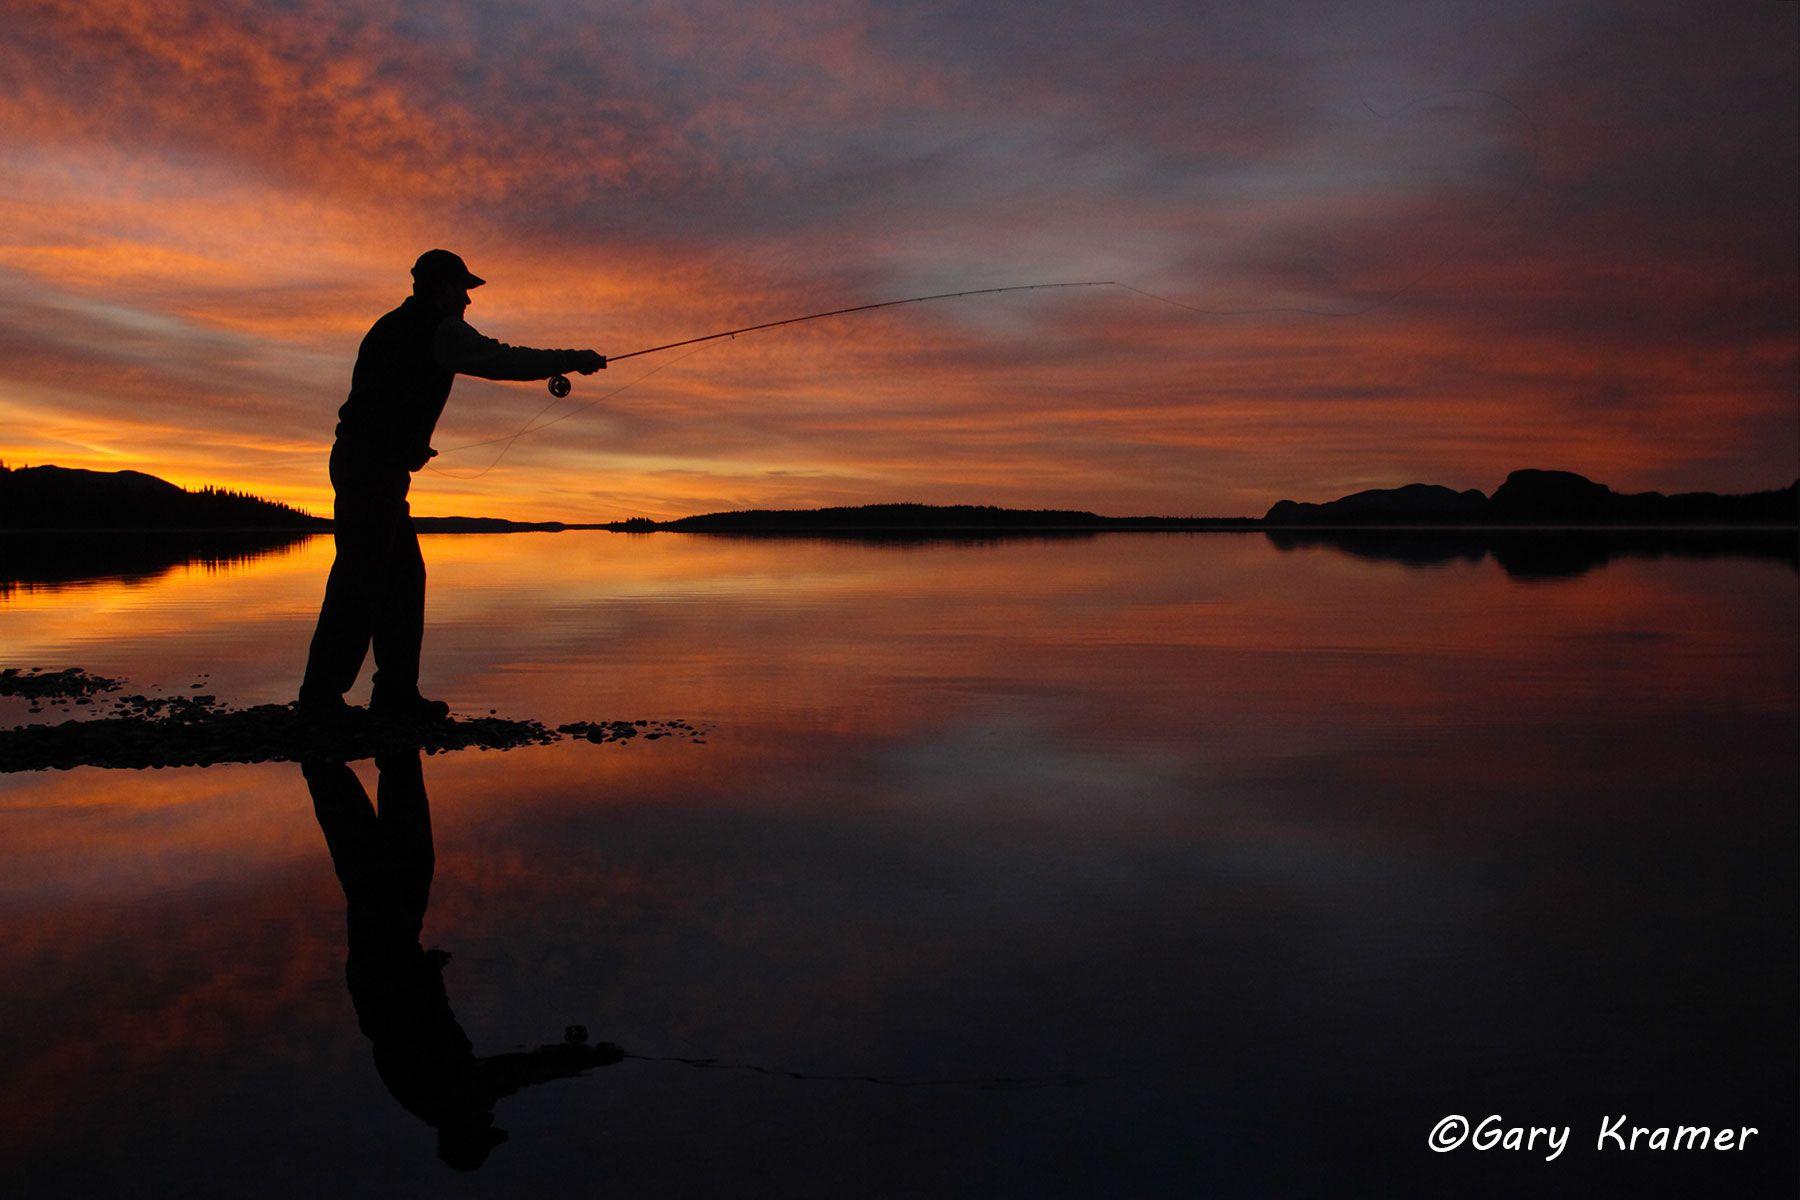 Fly Fishing at Sunset/Sunrise - GFS#266d